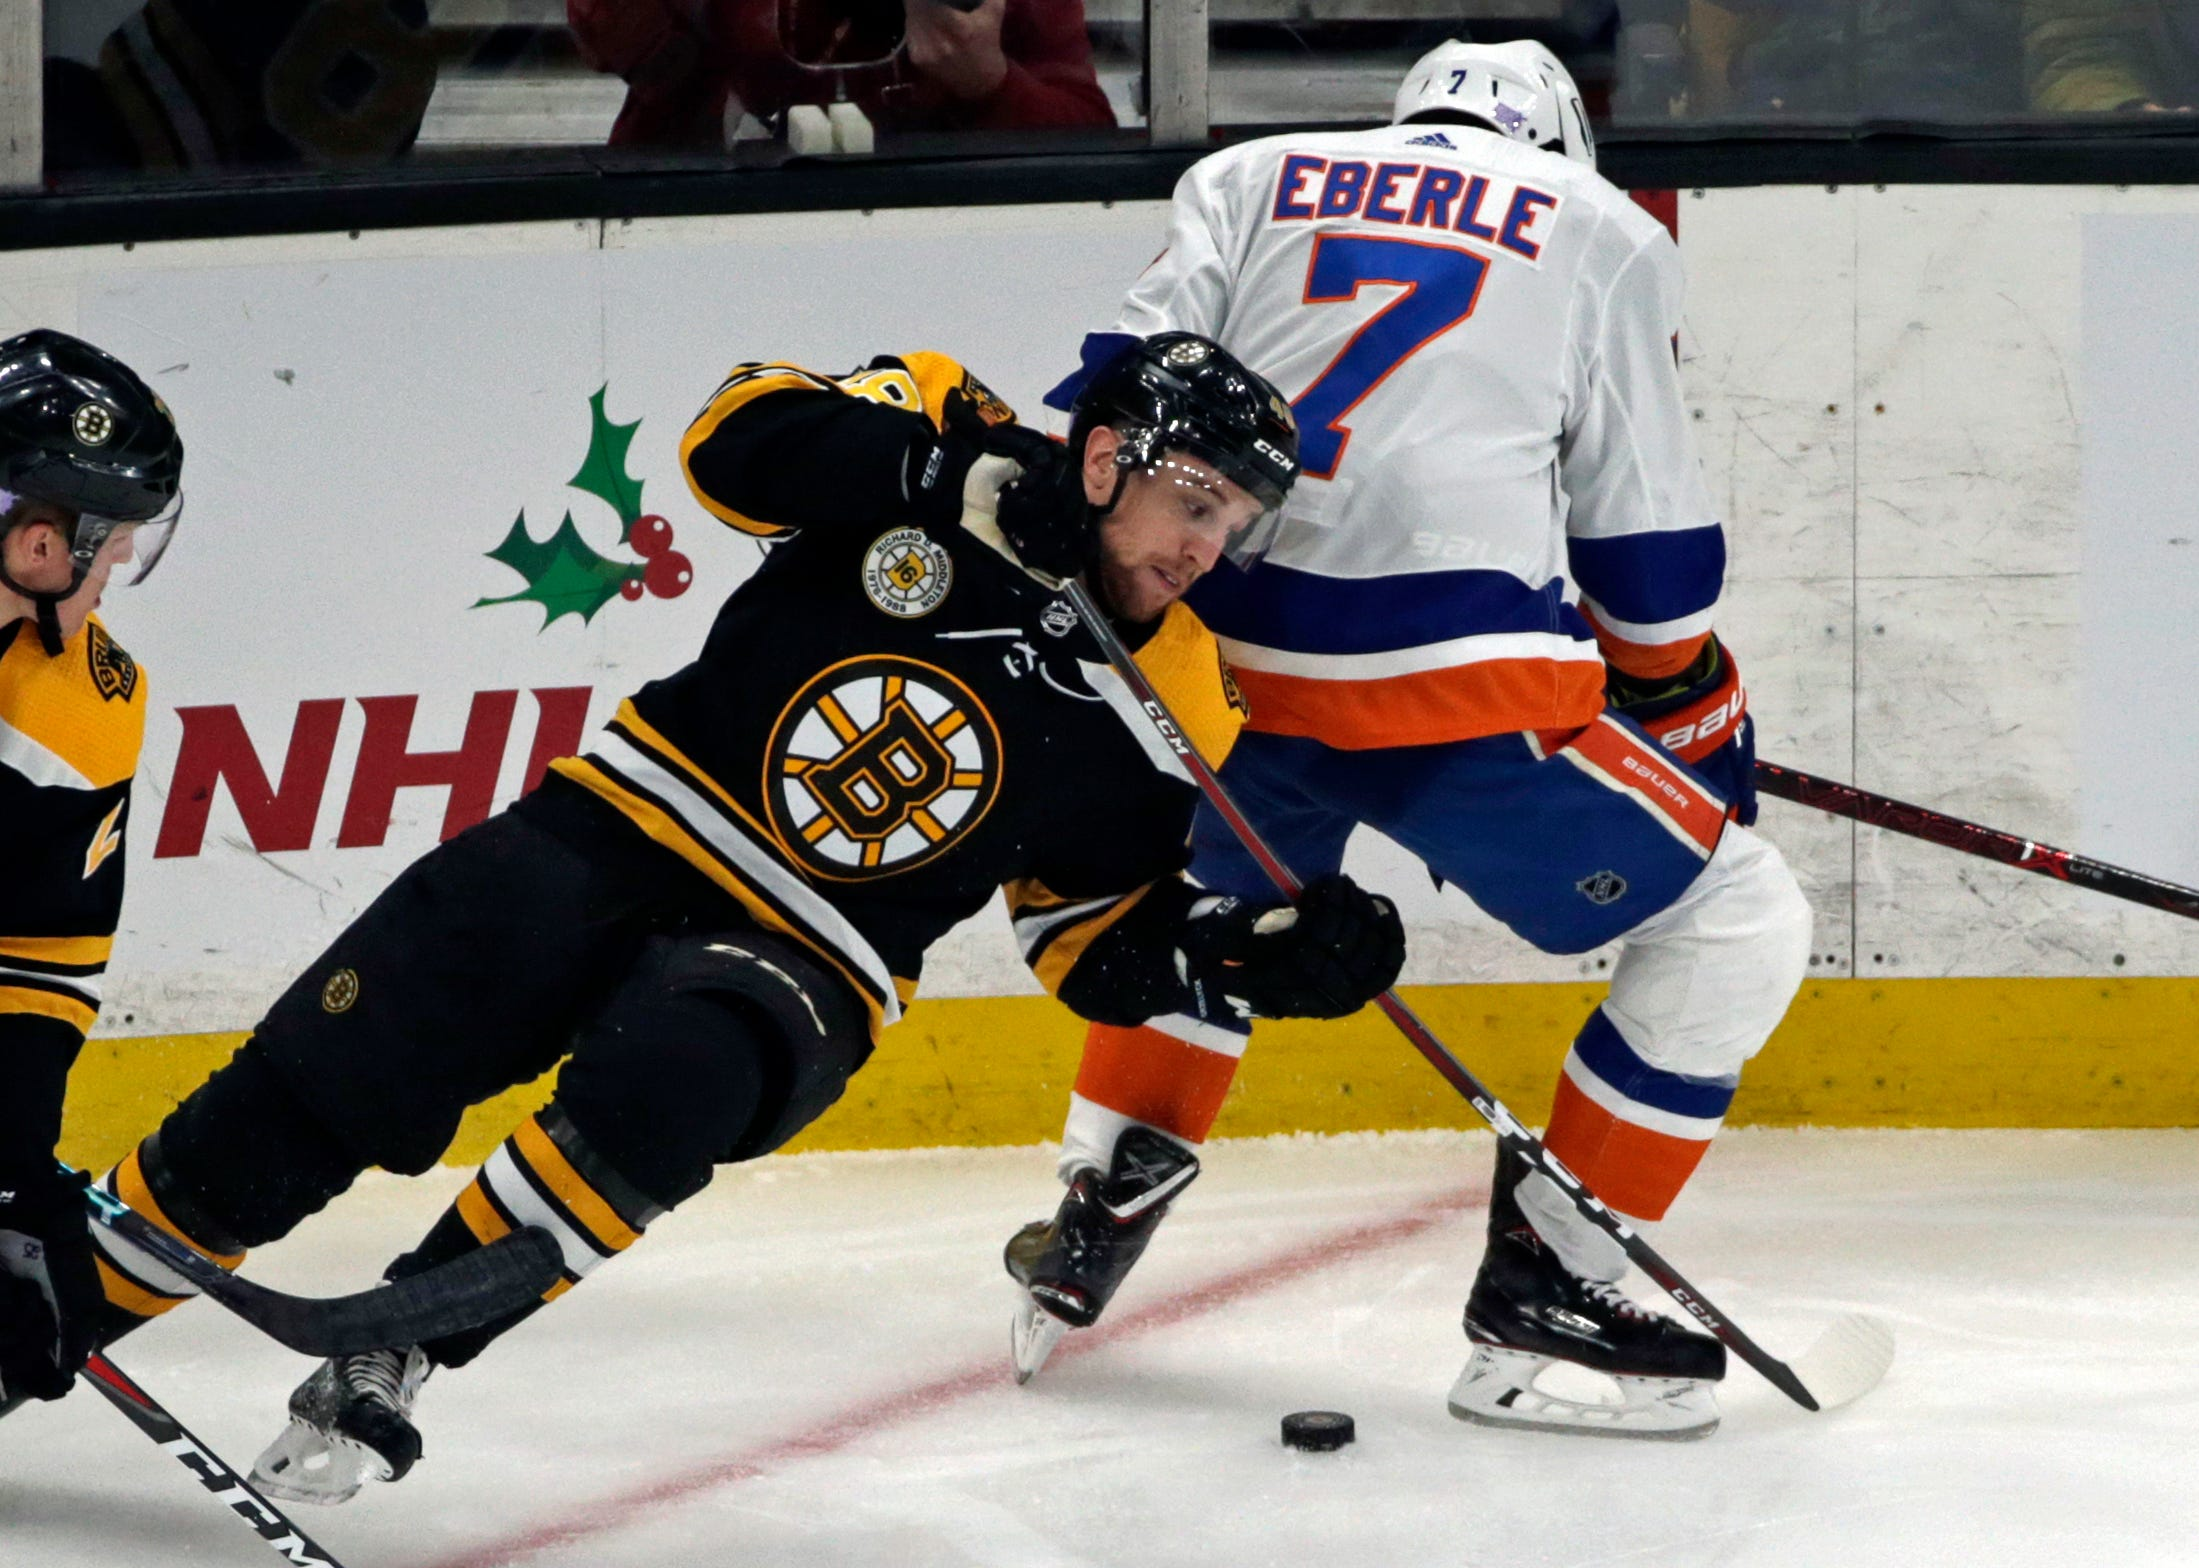 Donato nets shootout winner in return, Bruins best Isles 2-1